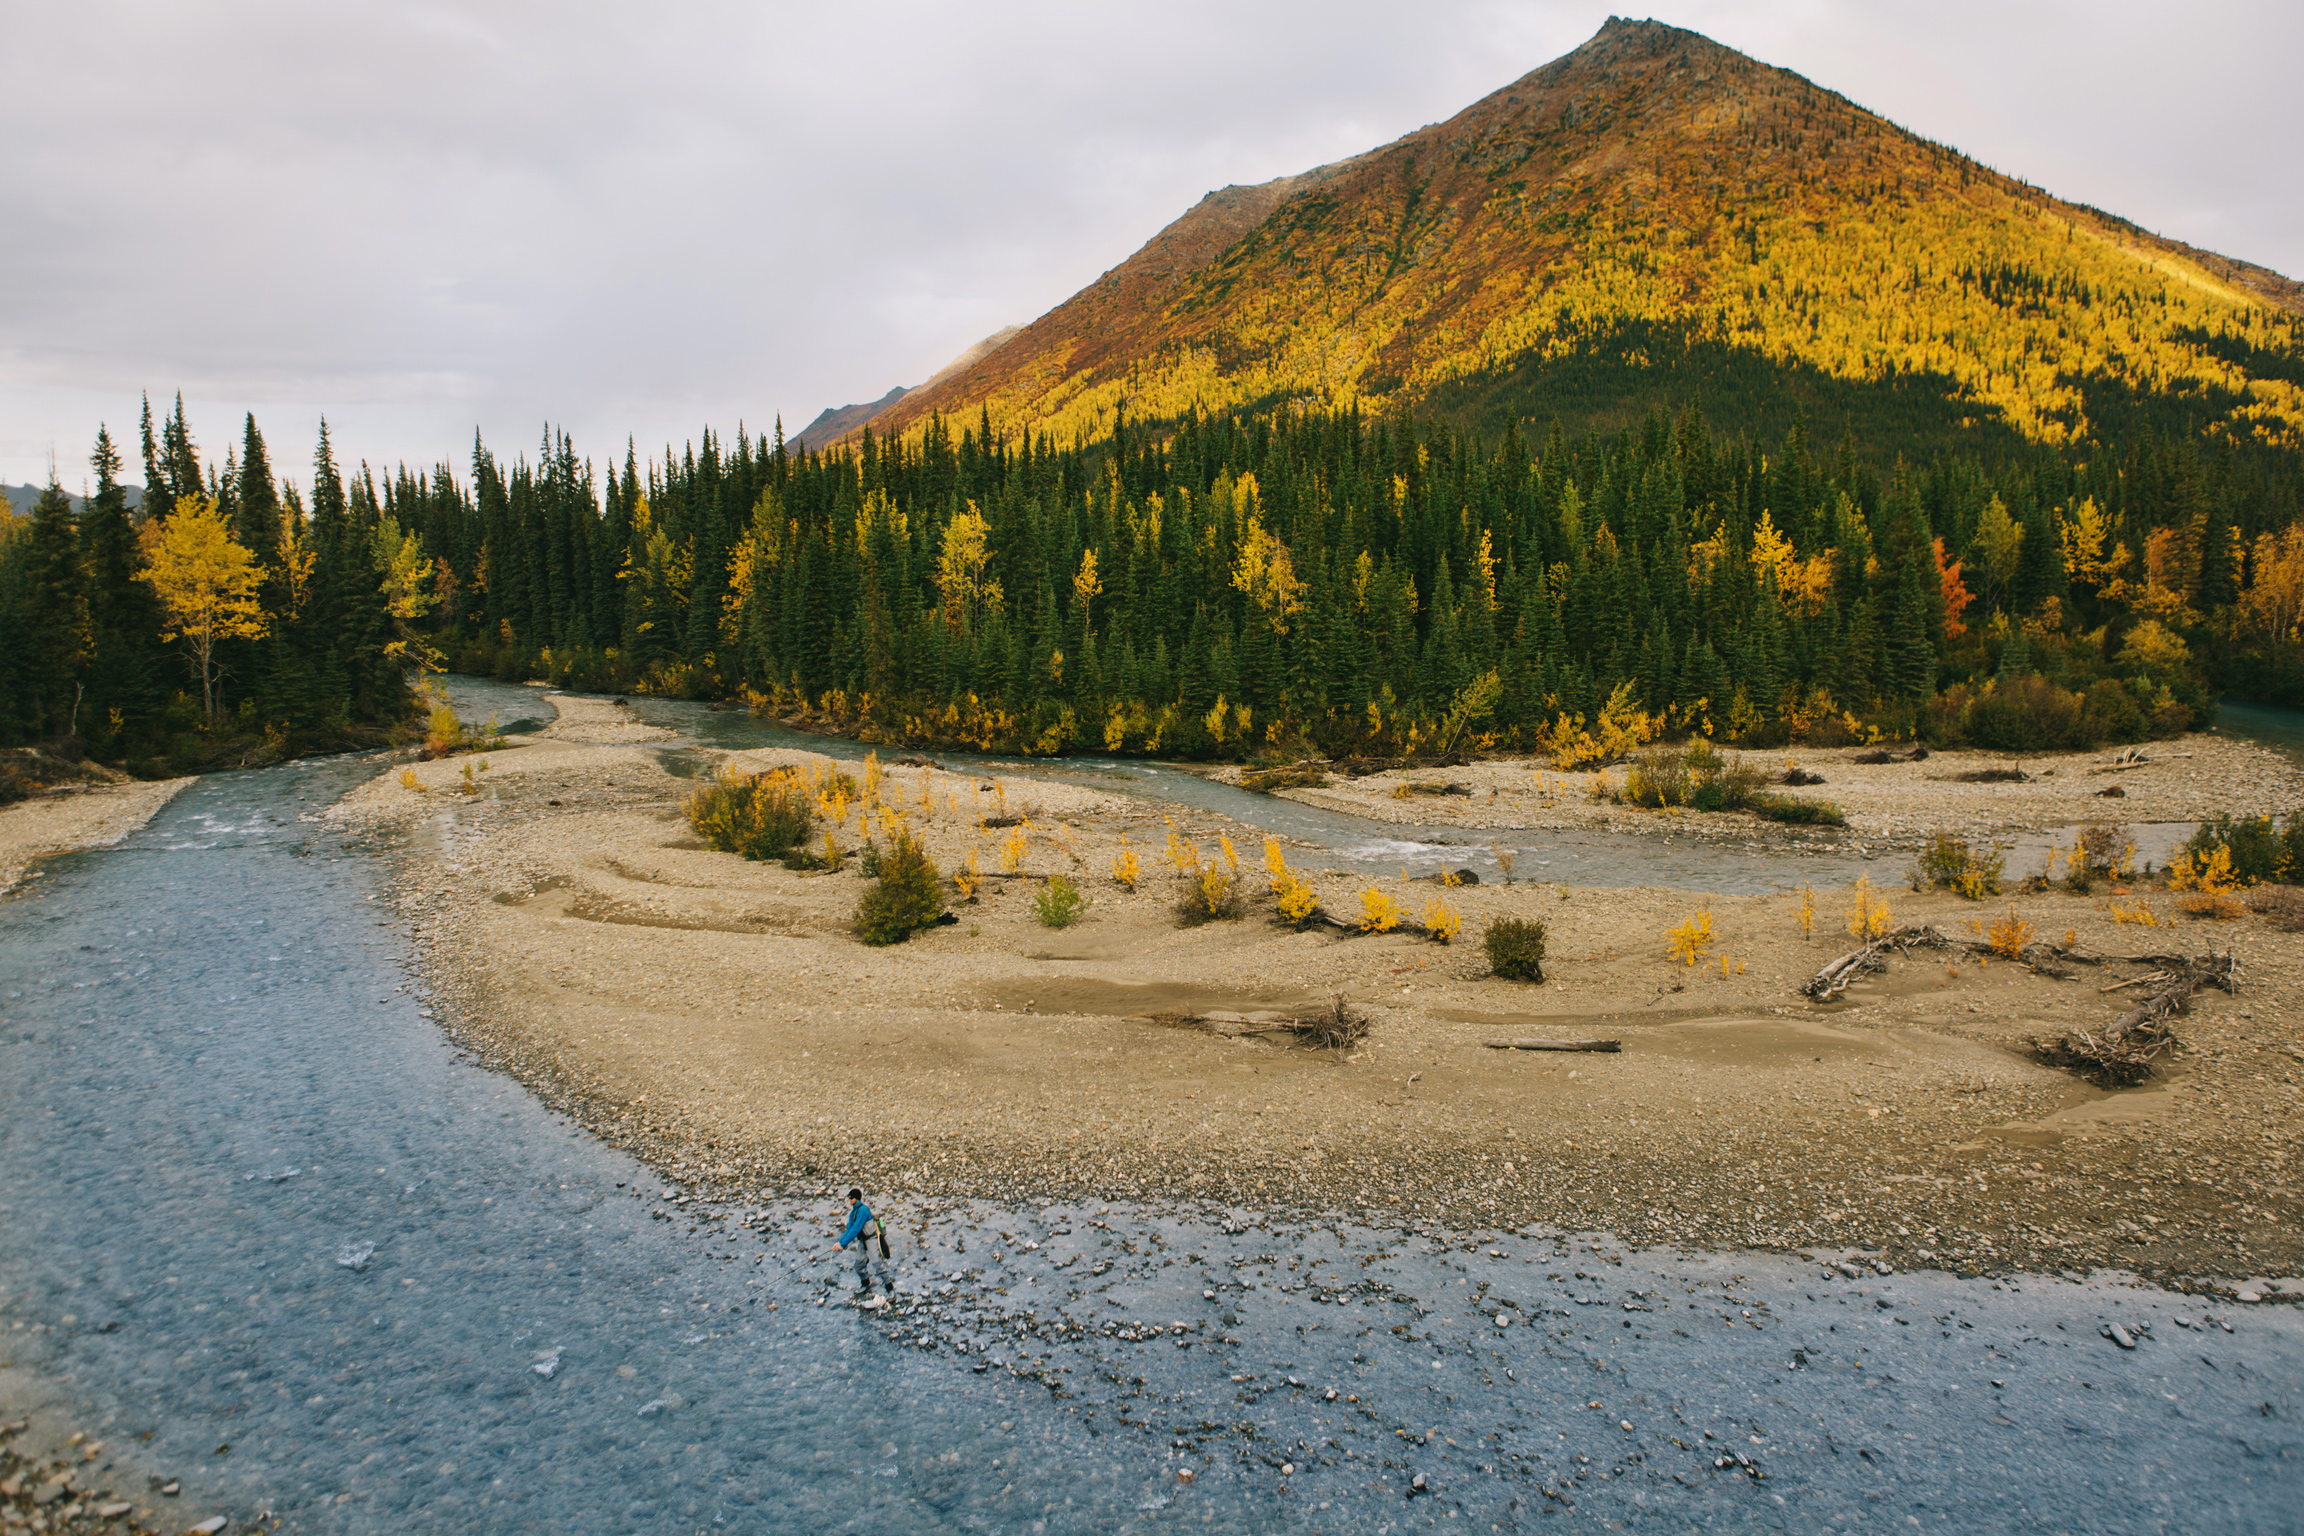 CindyGiovagnoli_Alaska_KoyukukRiver_SukakpakMountain_JimRiver_ArcticCircle_fly_fishing_September-054.jpg